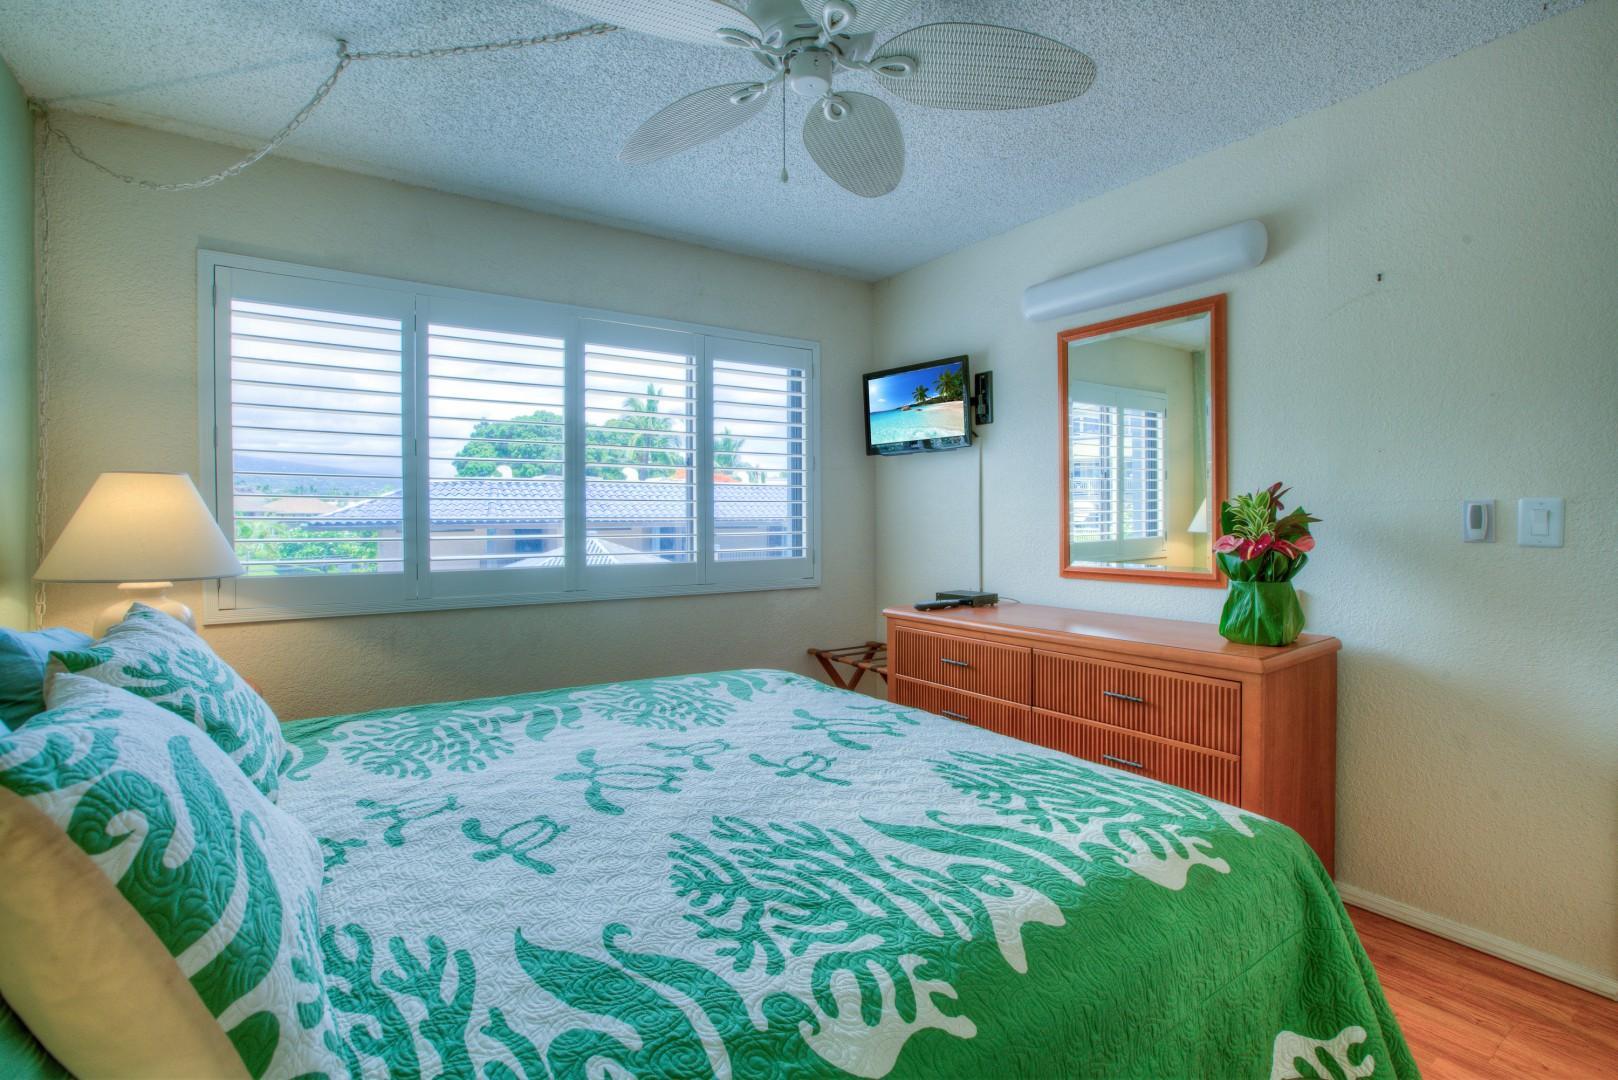 Bedroom has Views of Hualalai Mountain through Plantation Shutters.